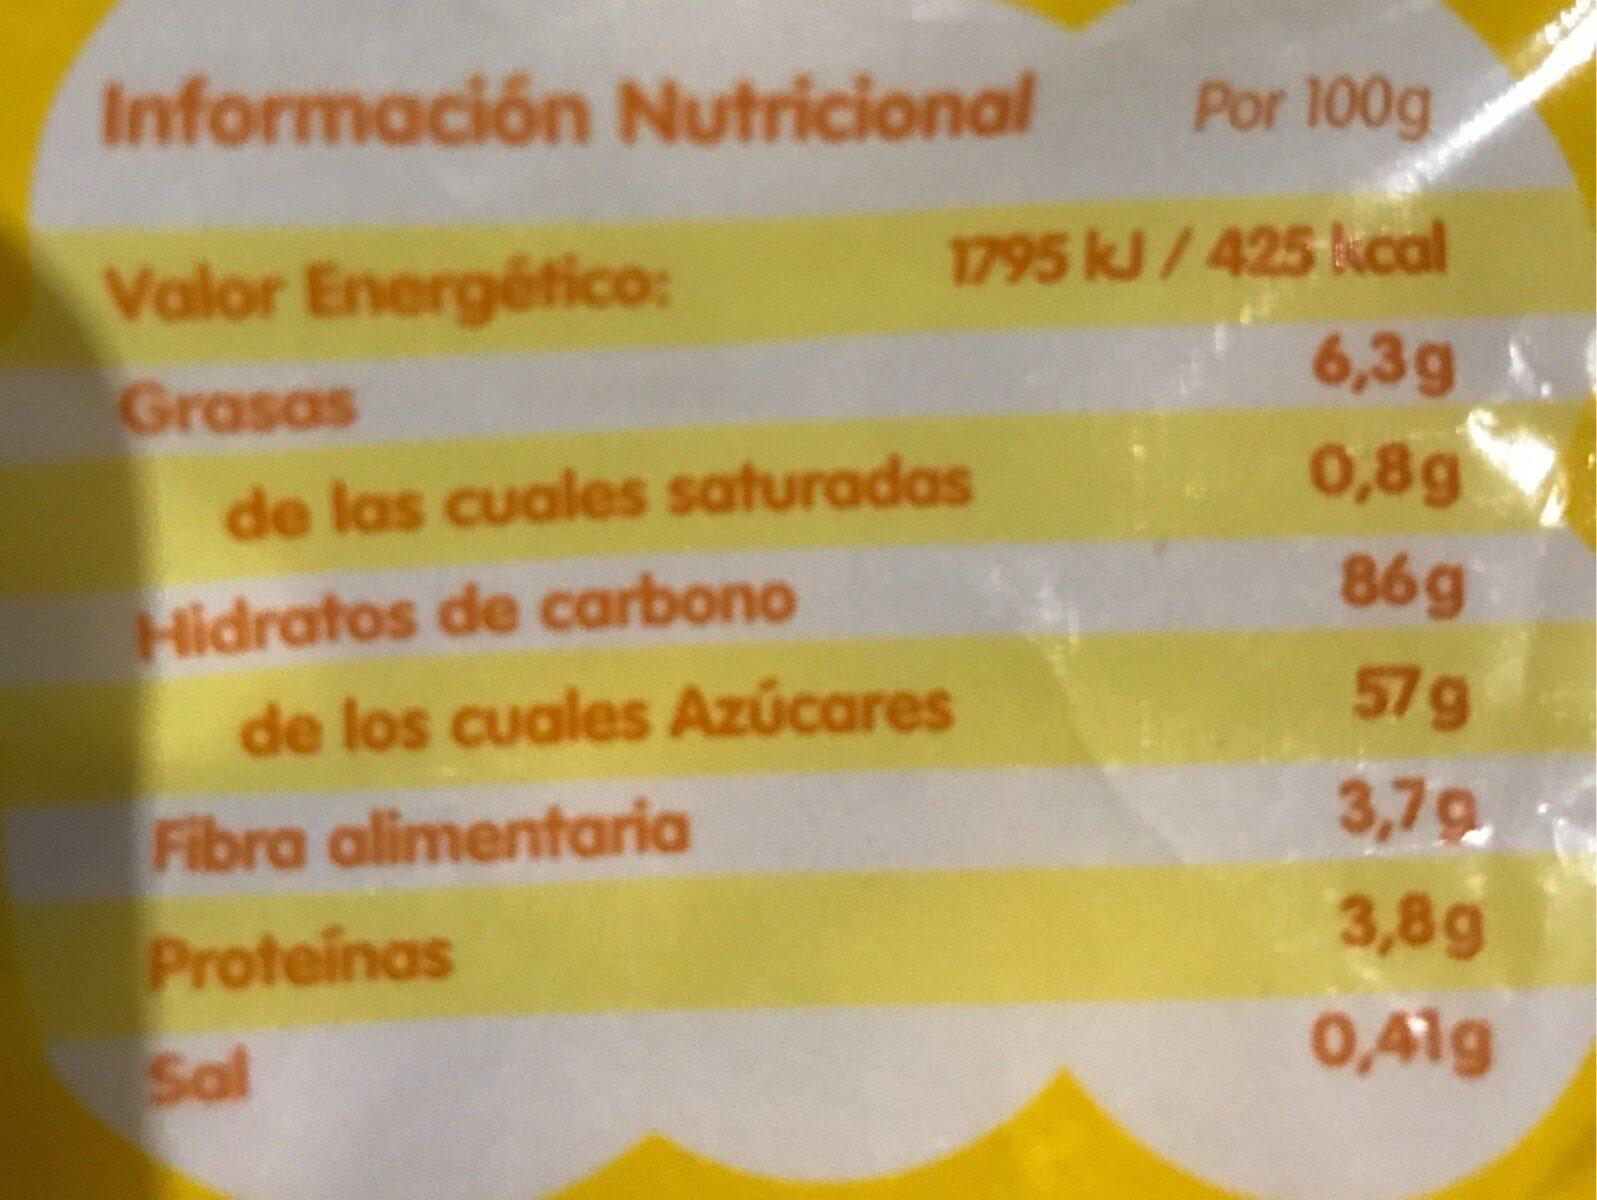 Palomitas bañadas caramelo sin gluten - Valori nutrizionali - es